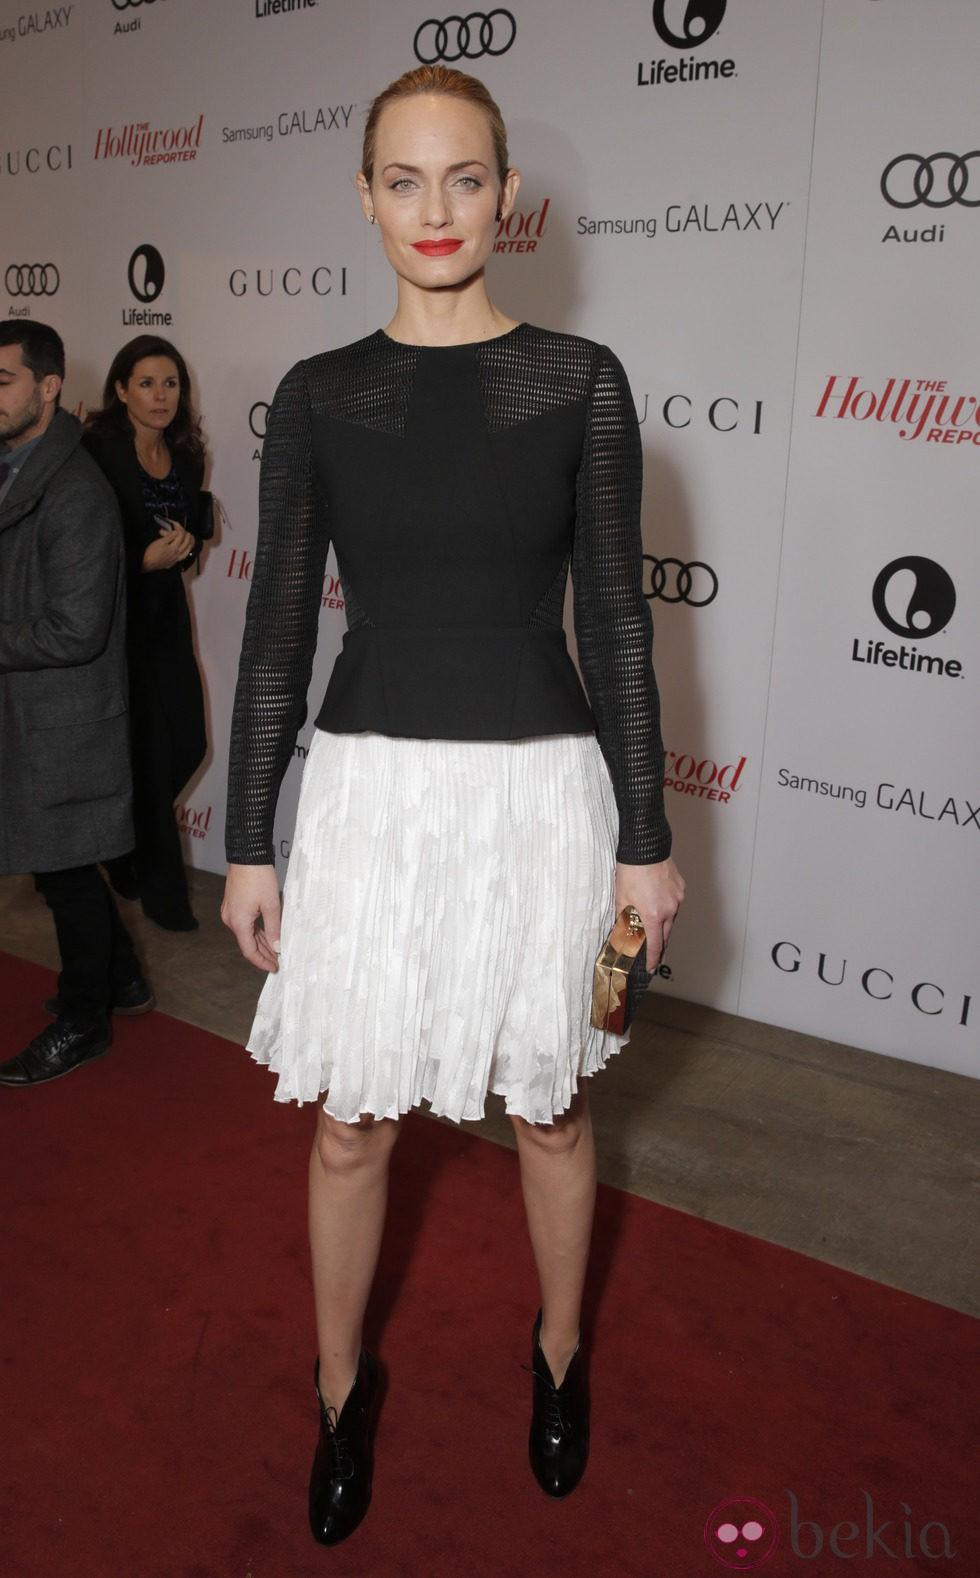 Amber Valletta en The Hollywood Reporter's Annual Power 100 Women 2013